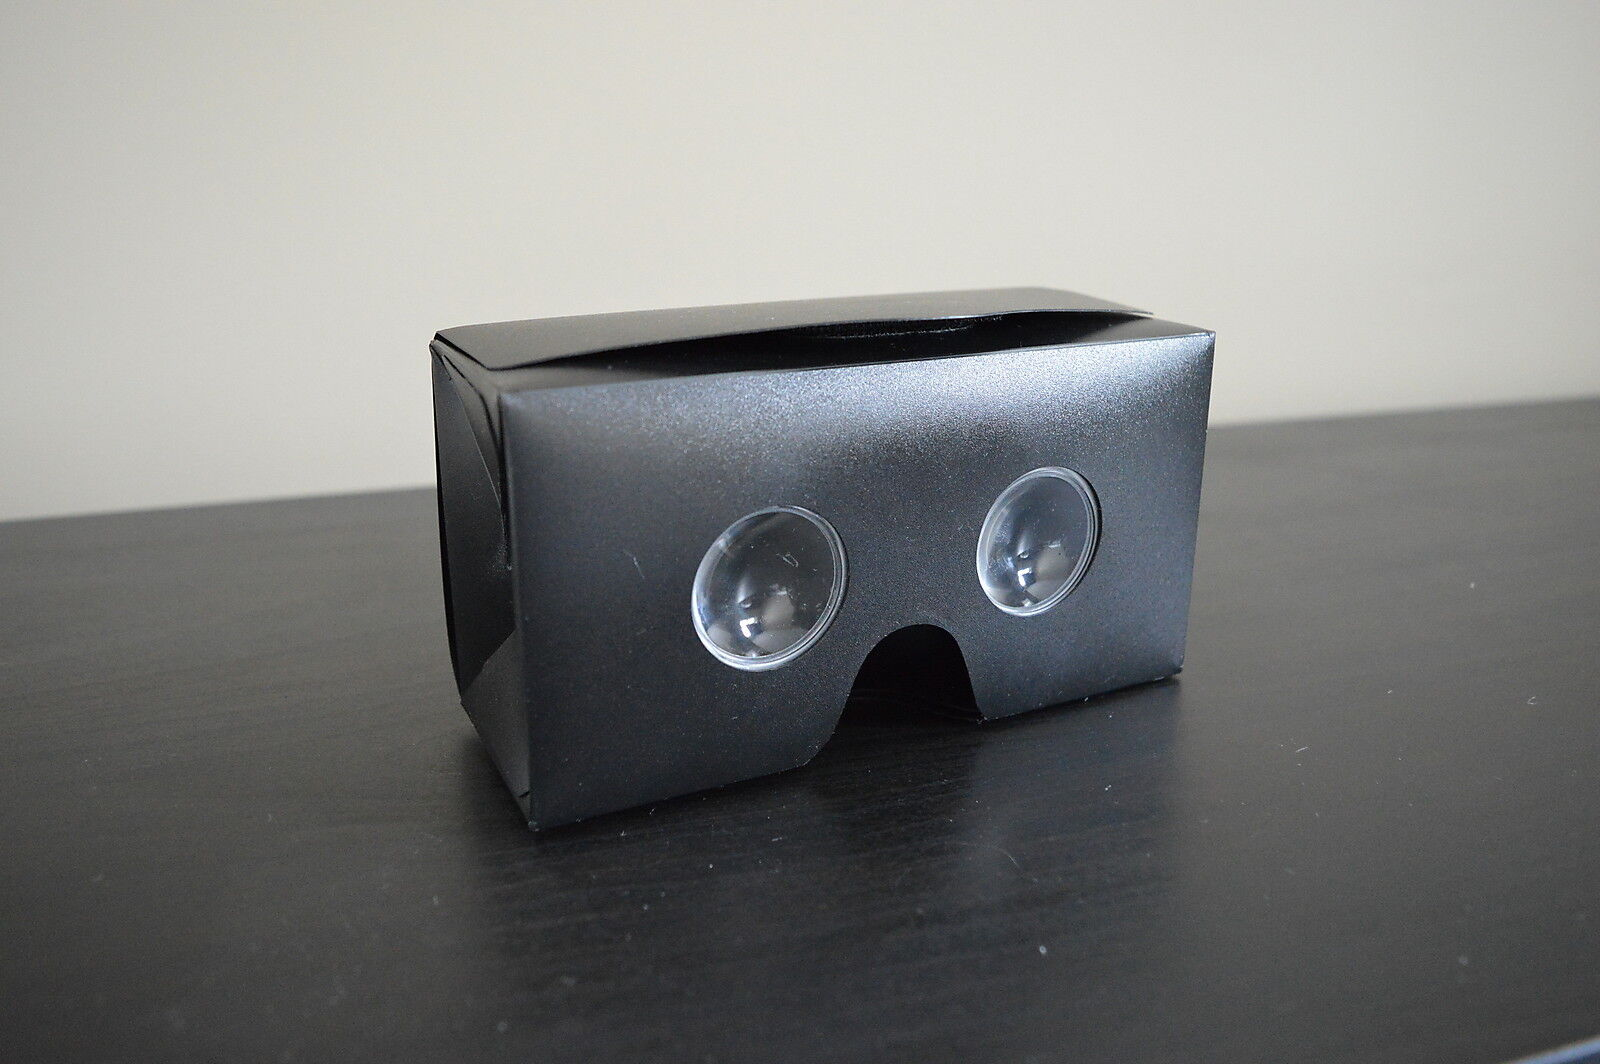 Google Cardboard Kit glasses video samsung vr 360 3d box